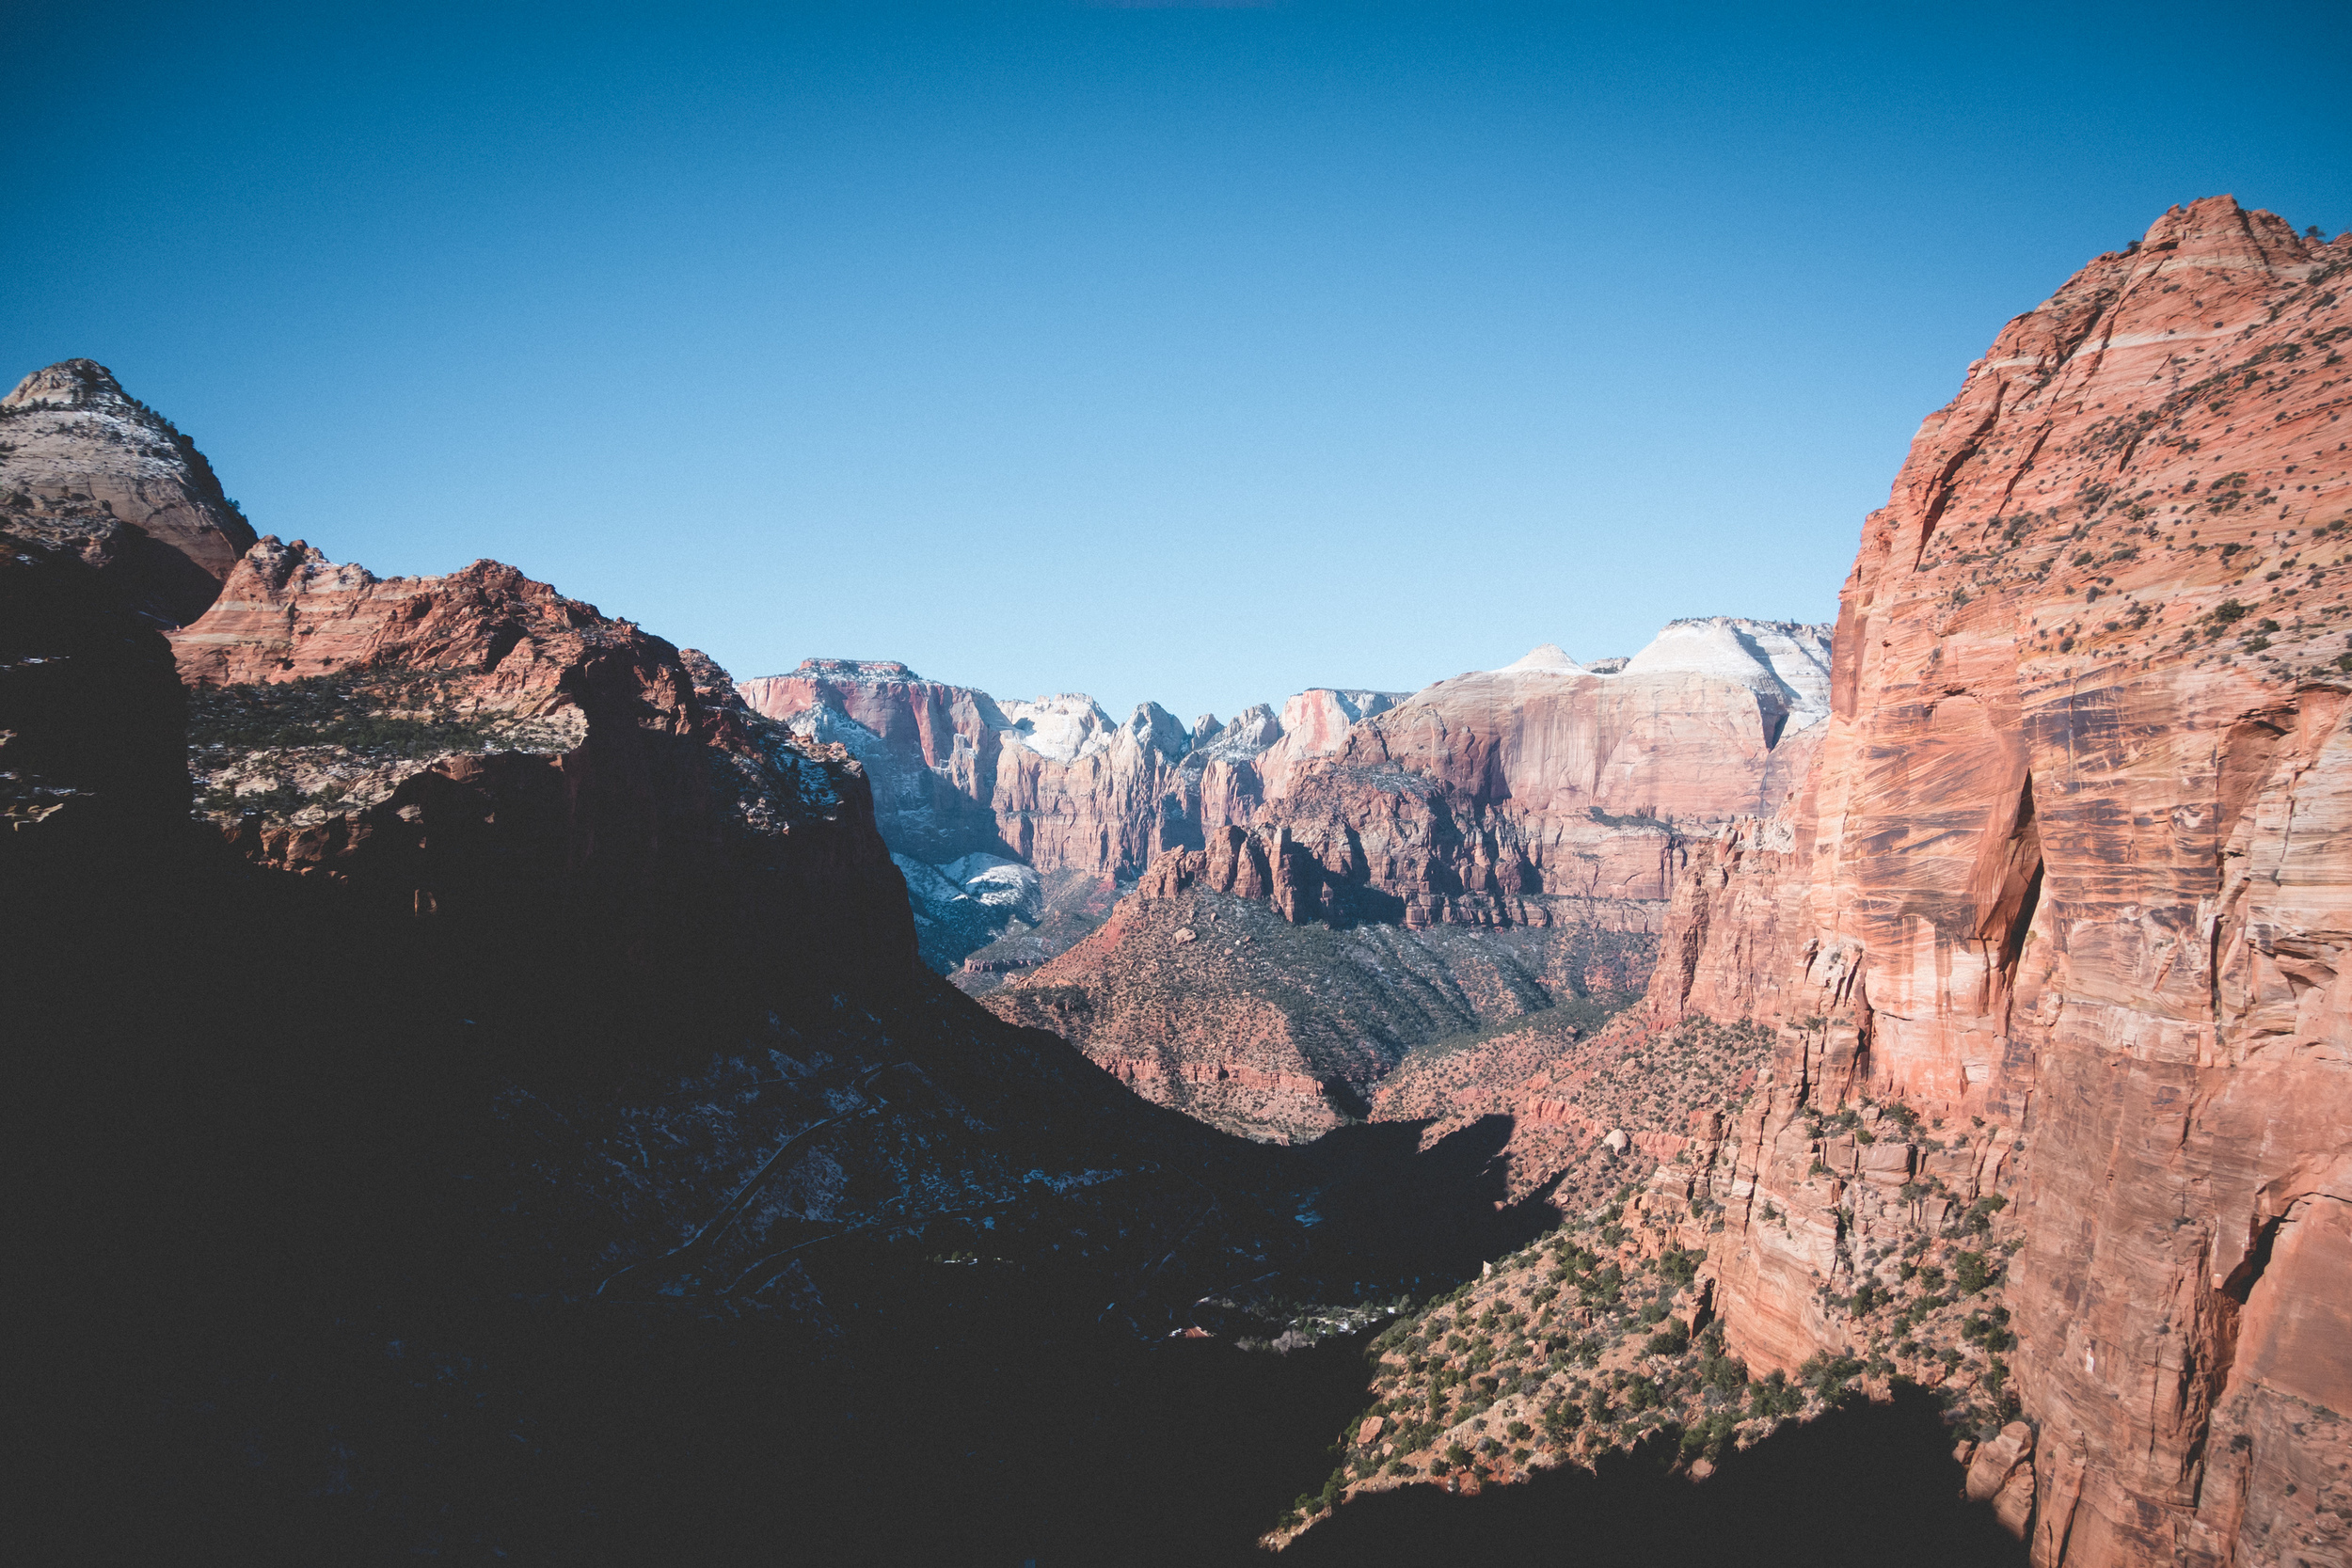 Zion-National-Park-10.jpg